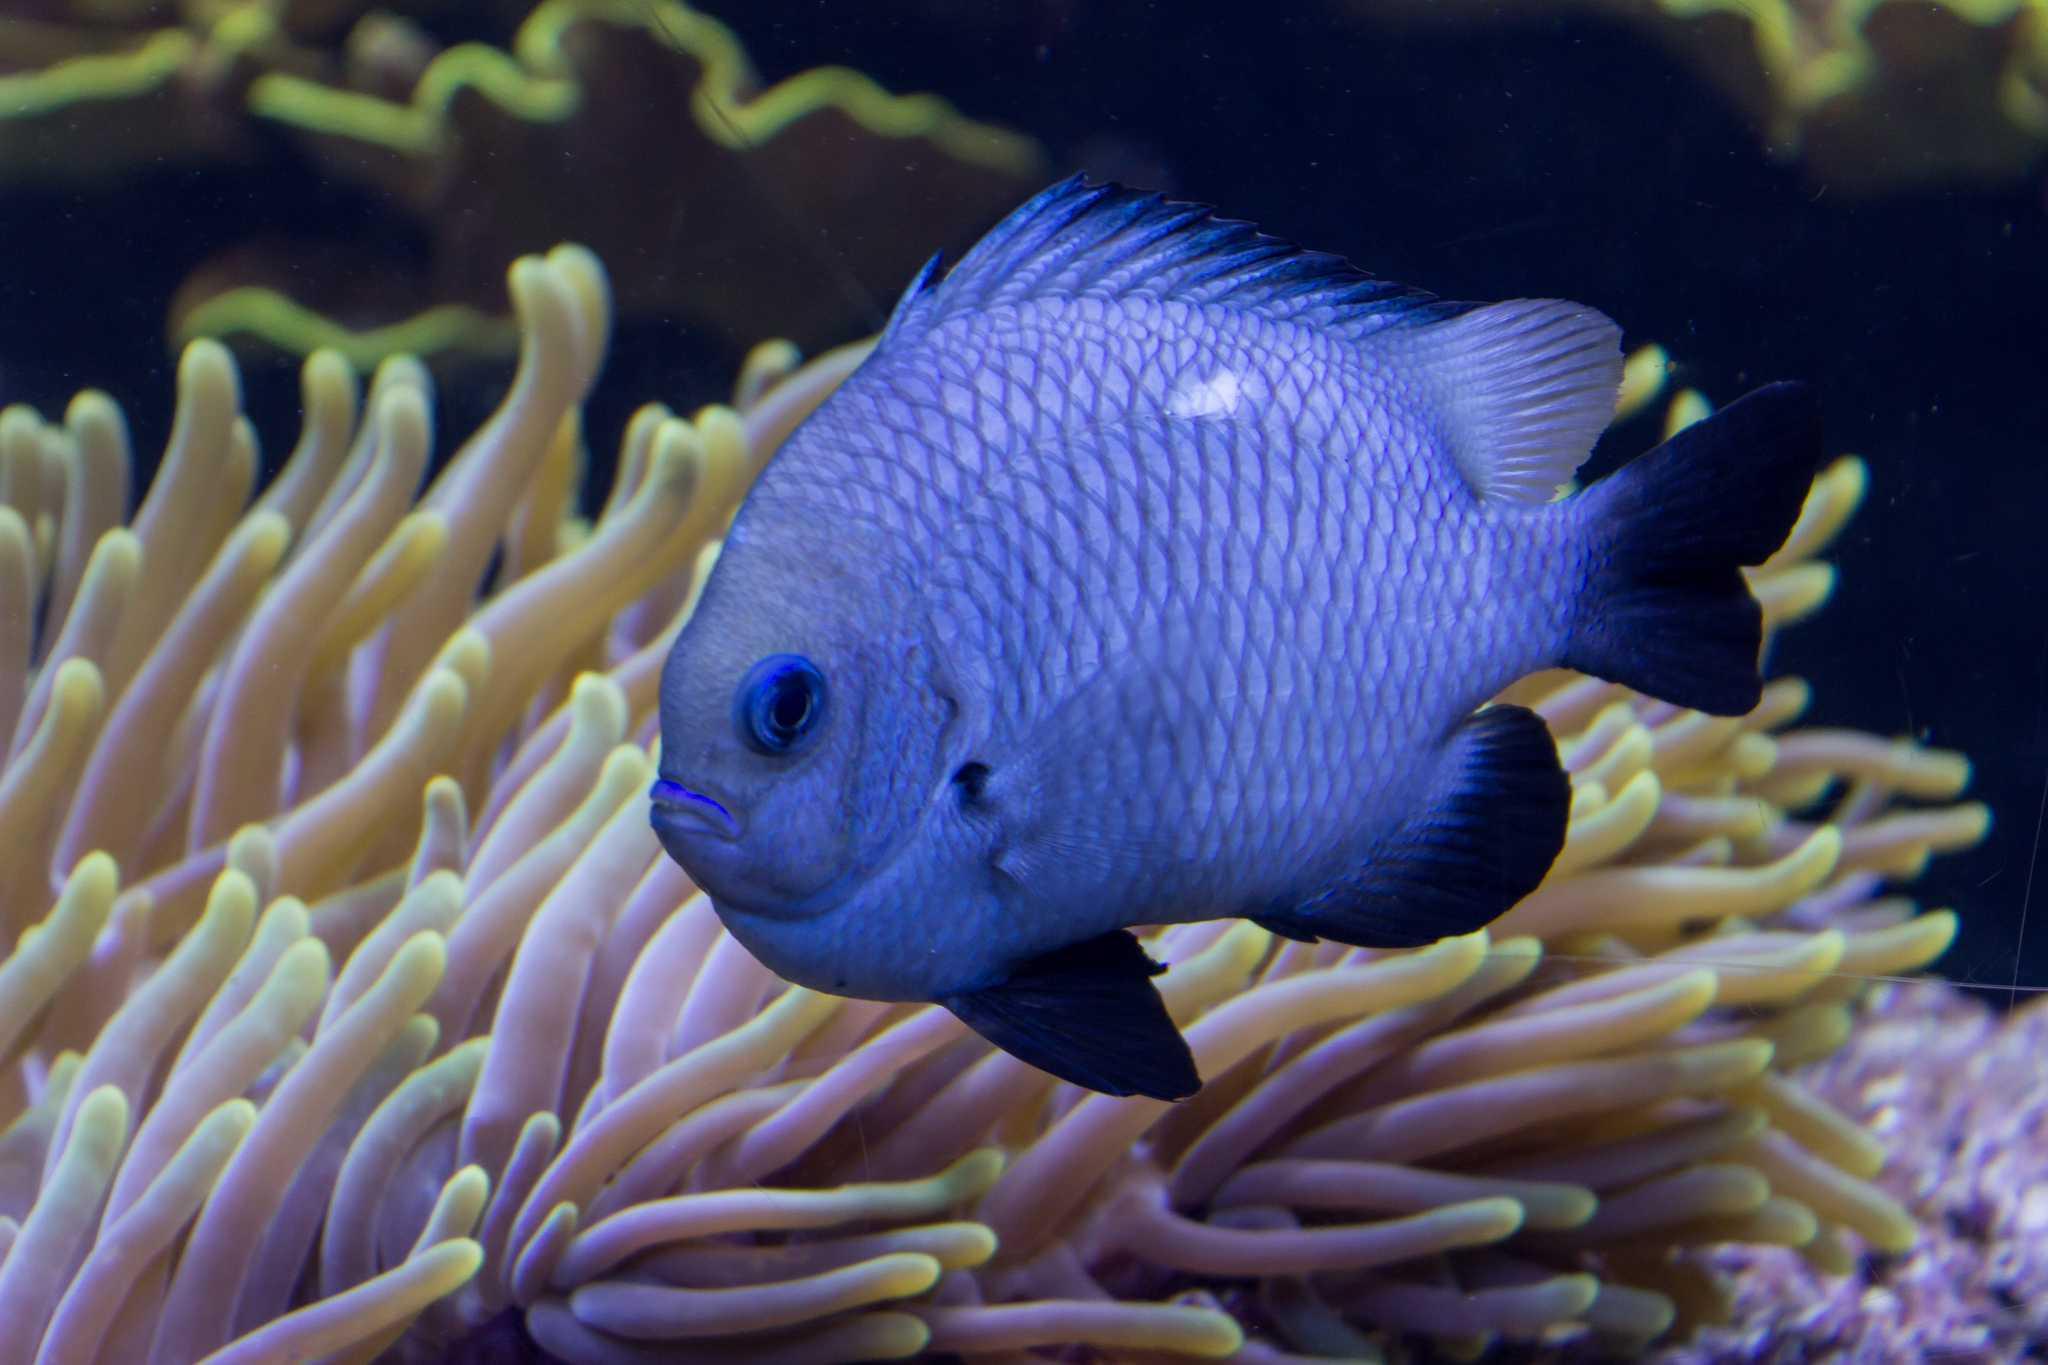 Blue fish swimming in a tank at the Long Island Aquarium